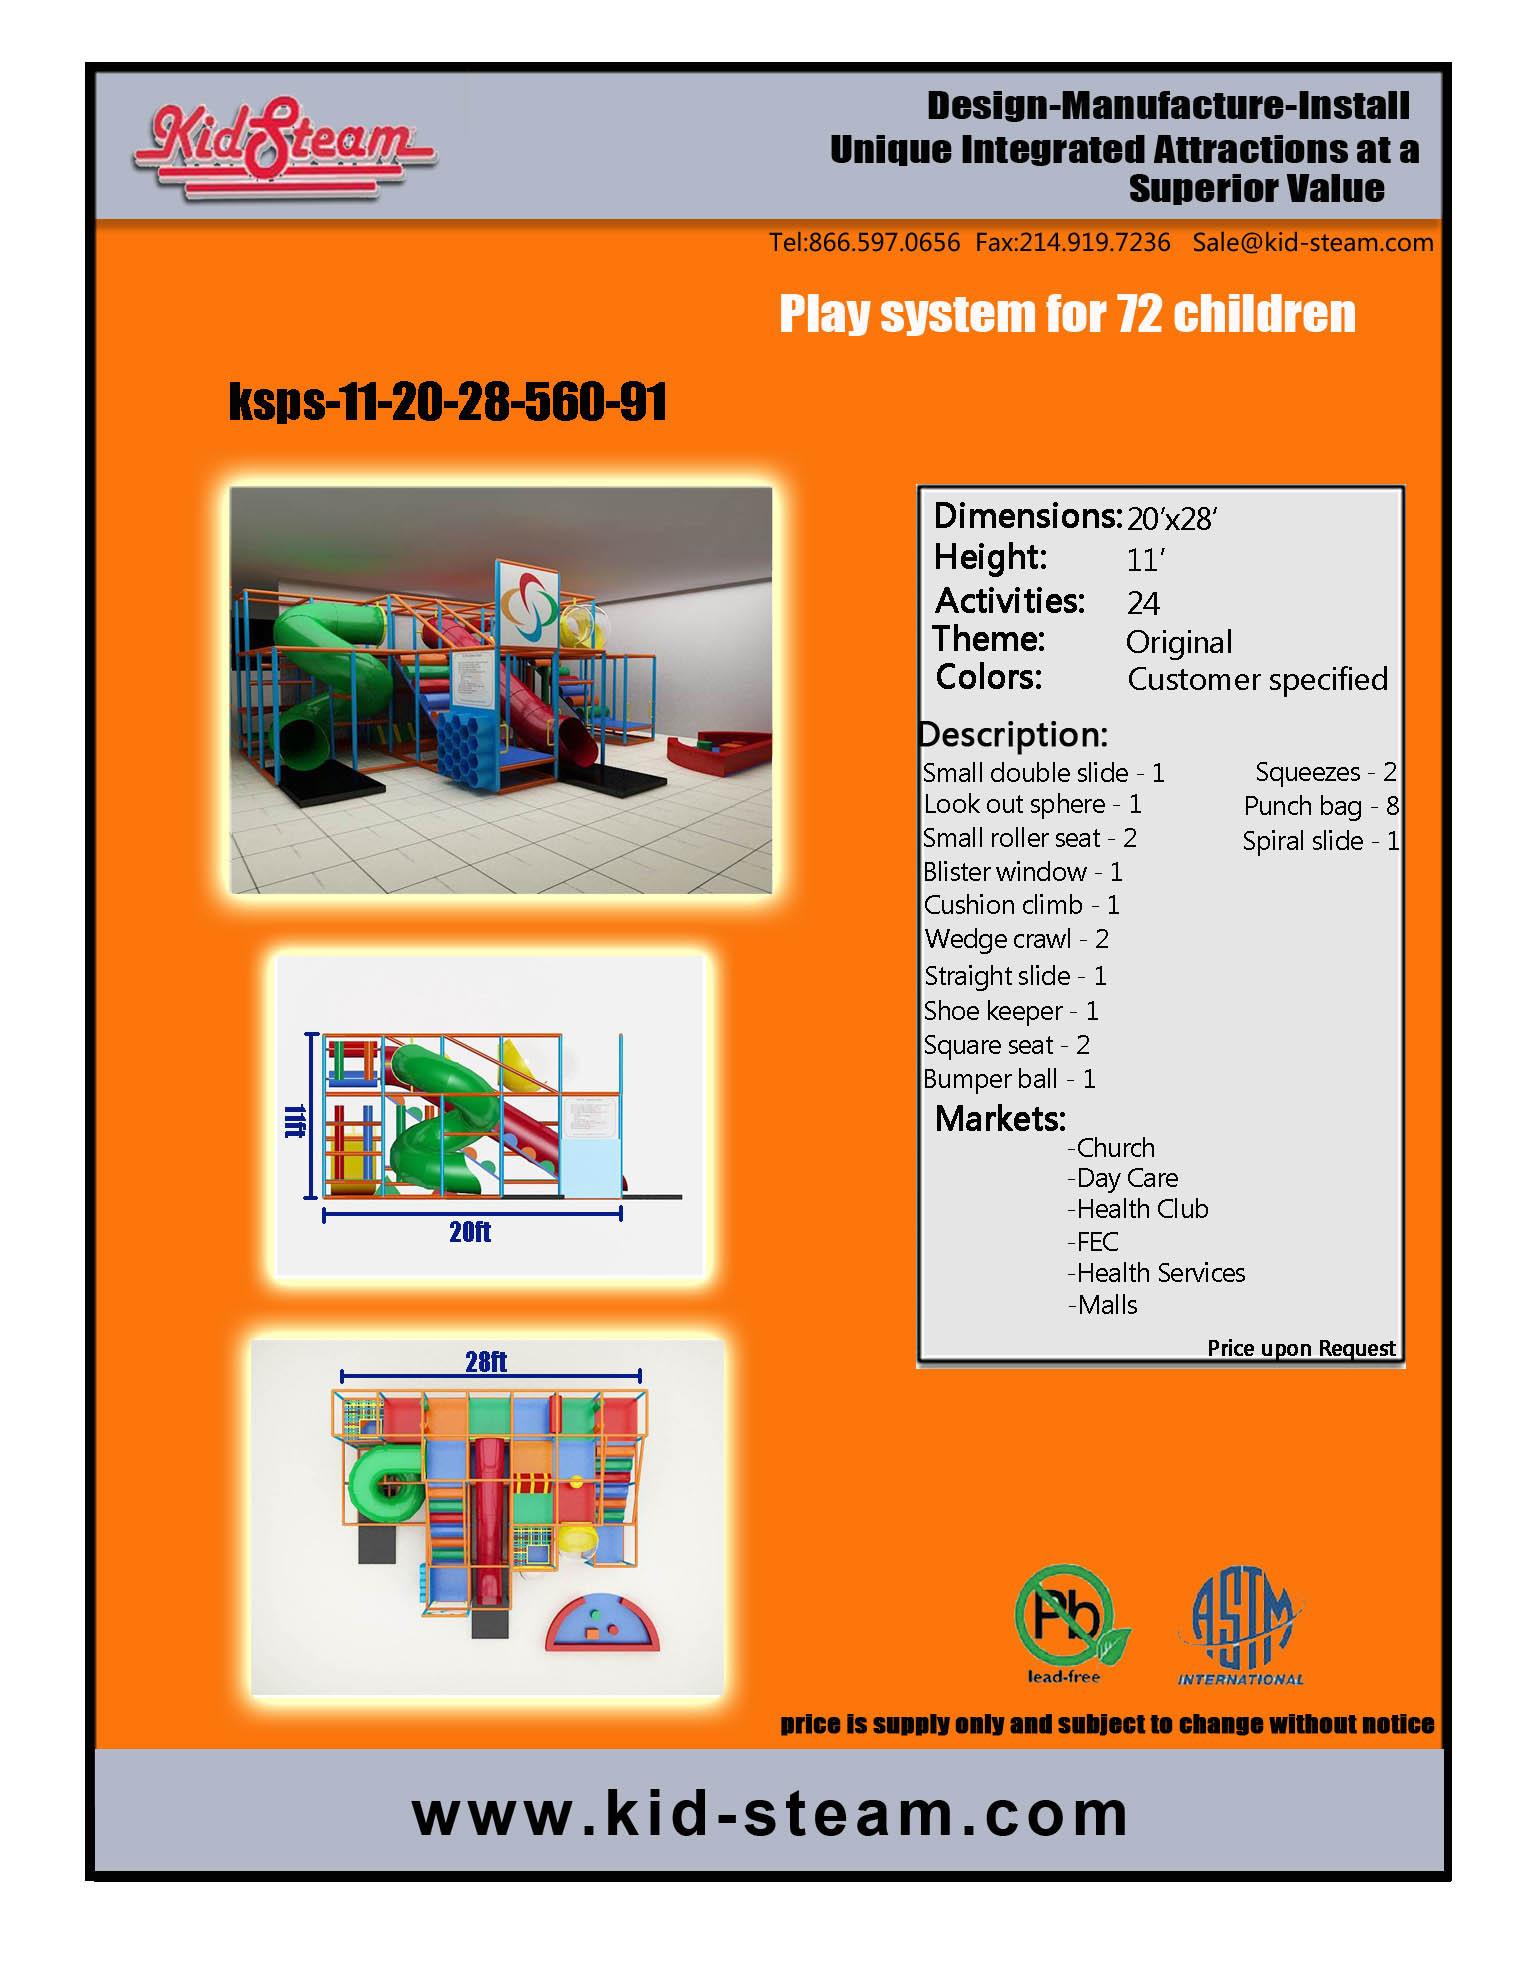 Indoor Playground Design: Budget: $23,000-$47,000 Ages: 3-12